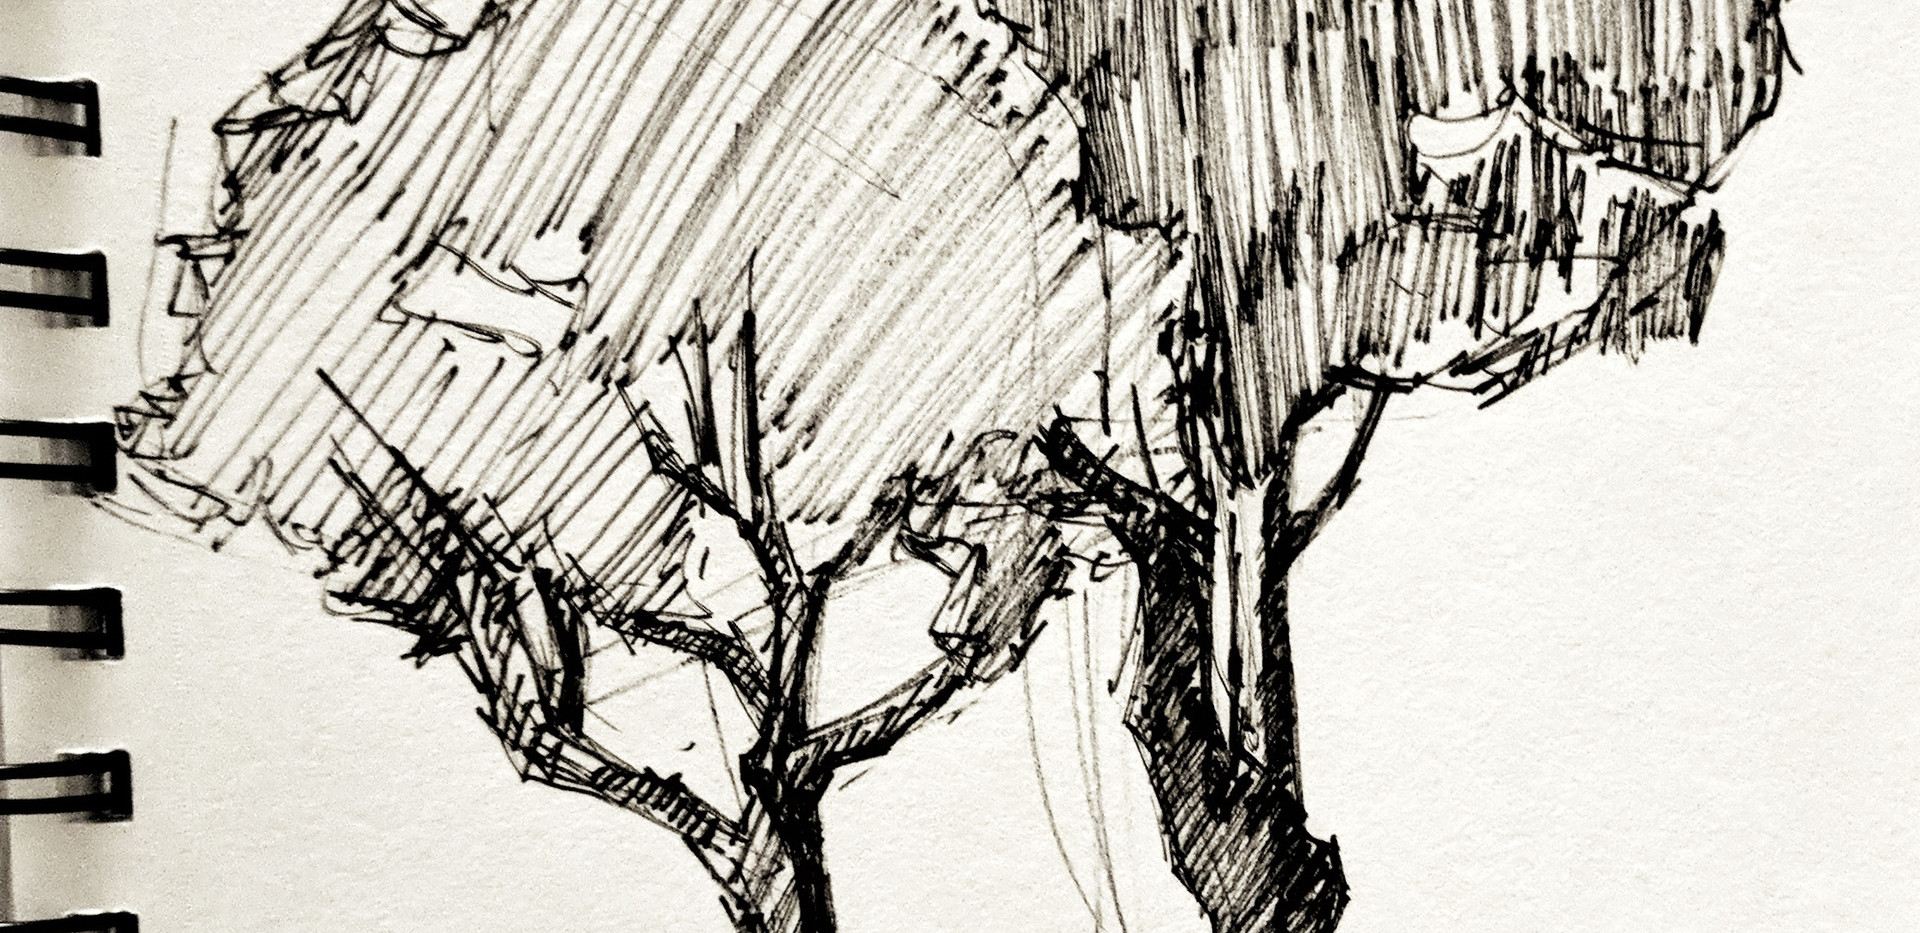 Zebra Brushpen sketch